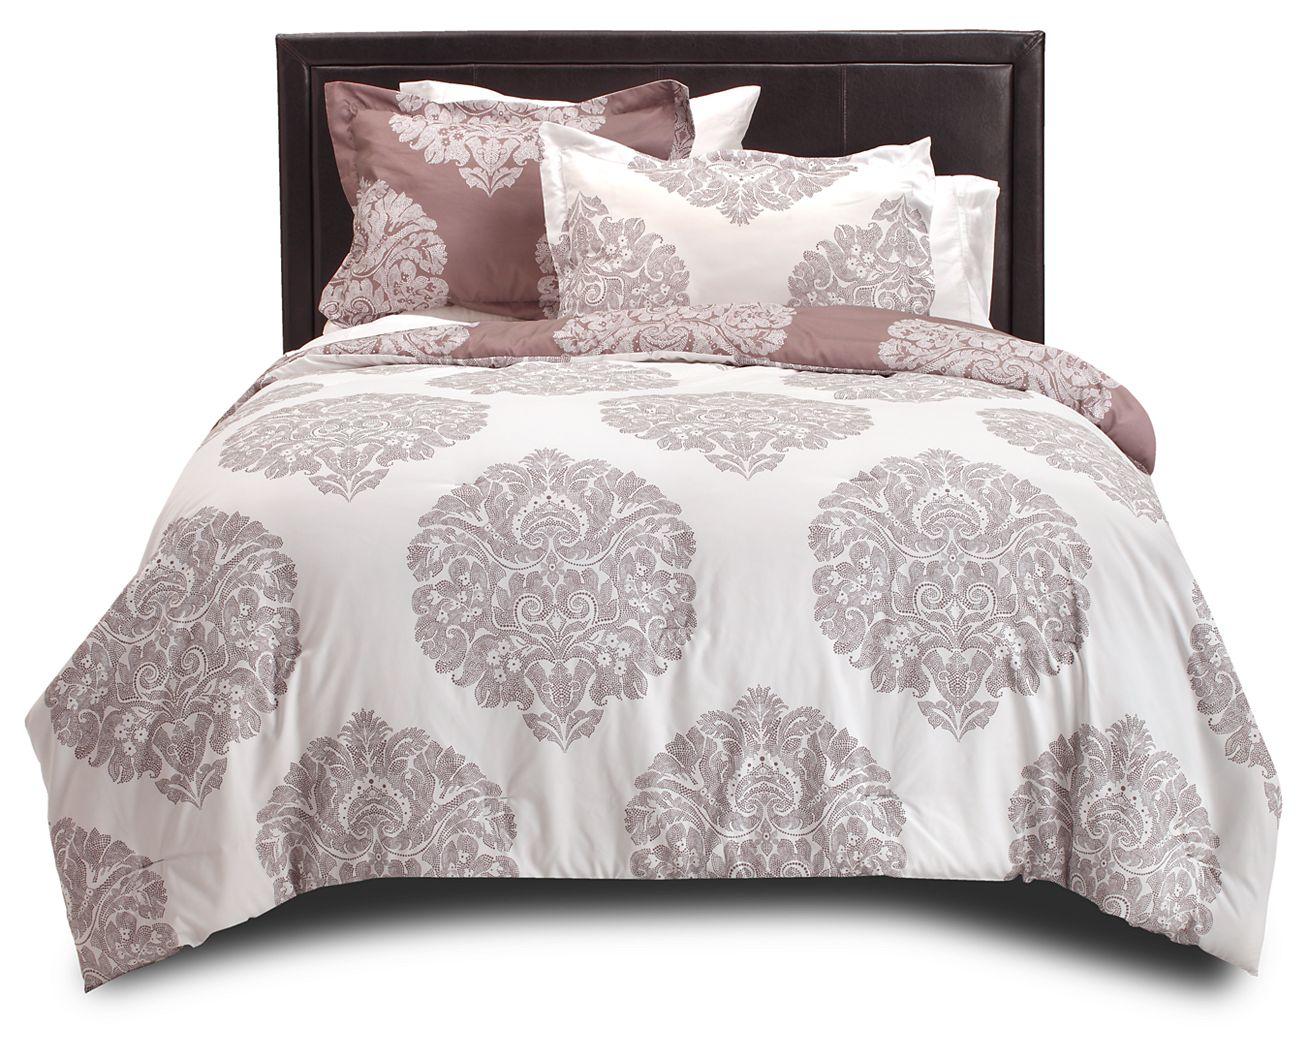 Luxury Bedding Sets, Comforter Sets   Furniture Row